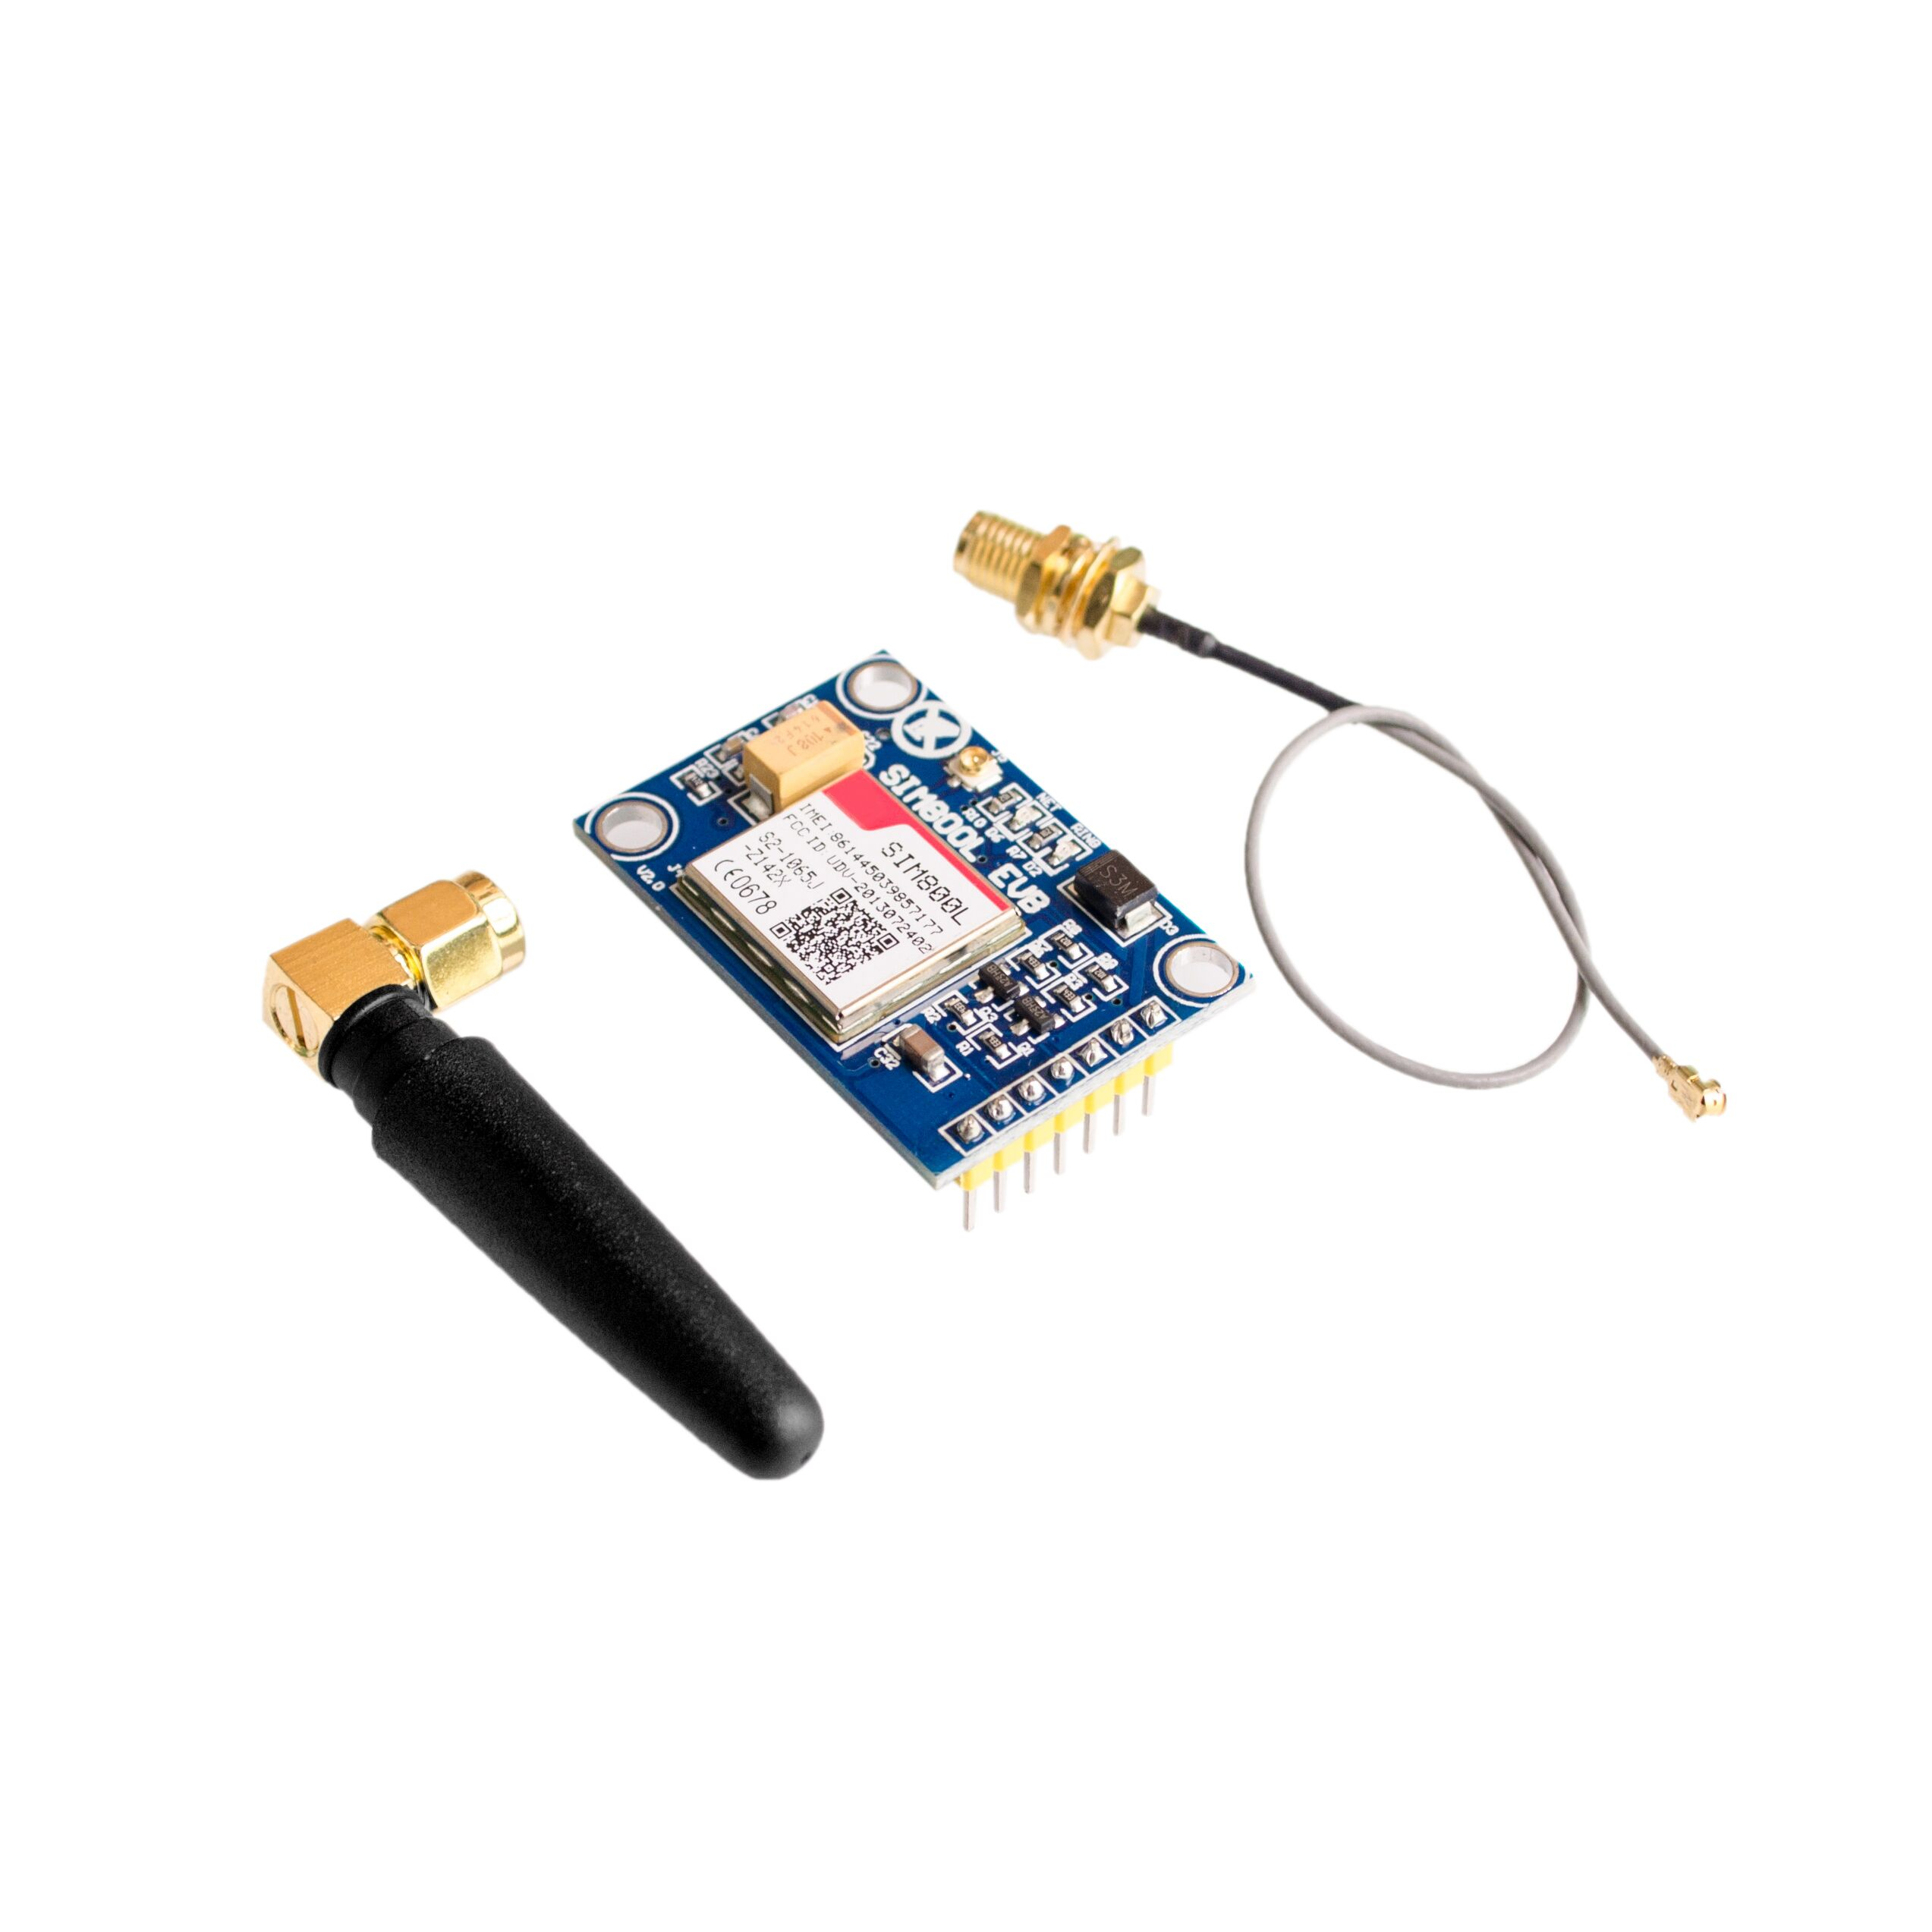 New SIM800L GPRS GSM Module w/ PCB Antenna SIM Board Quad band for Arduino(China)